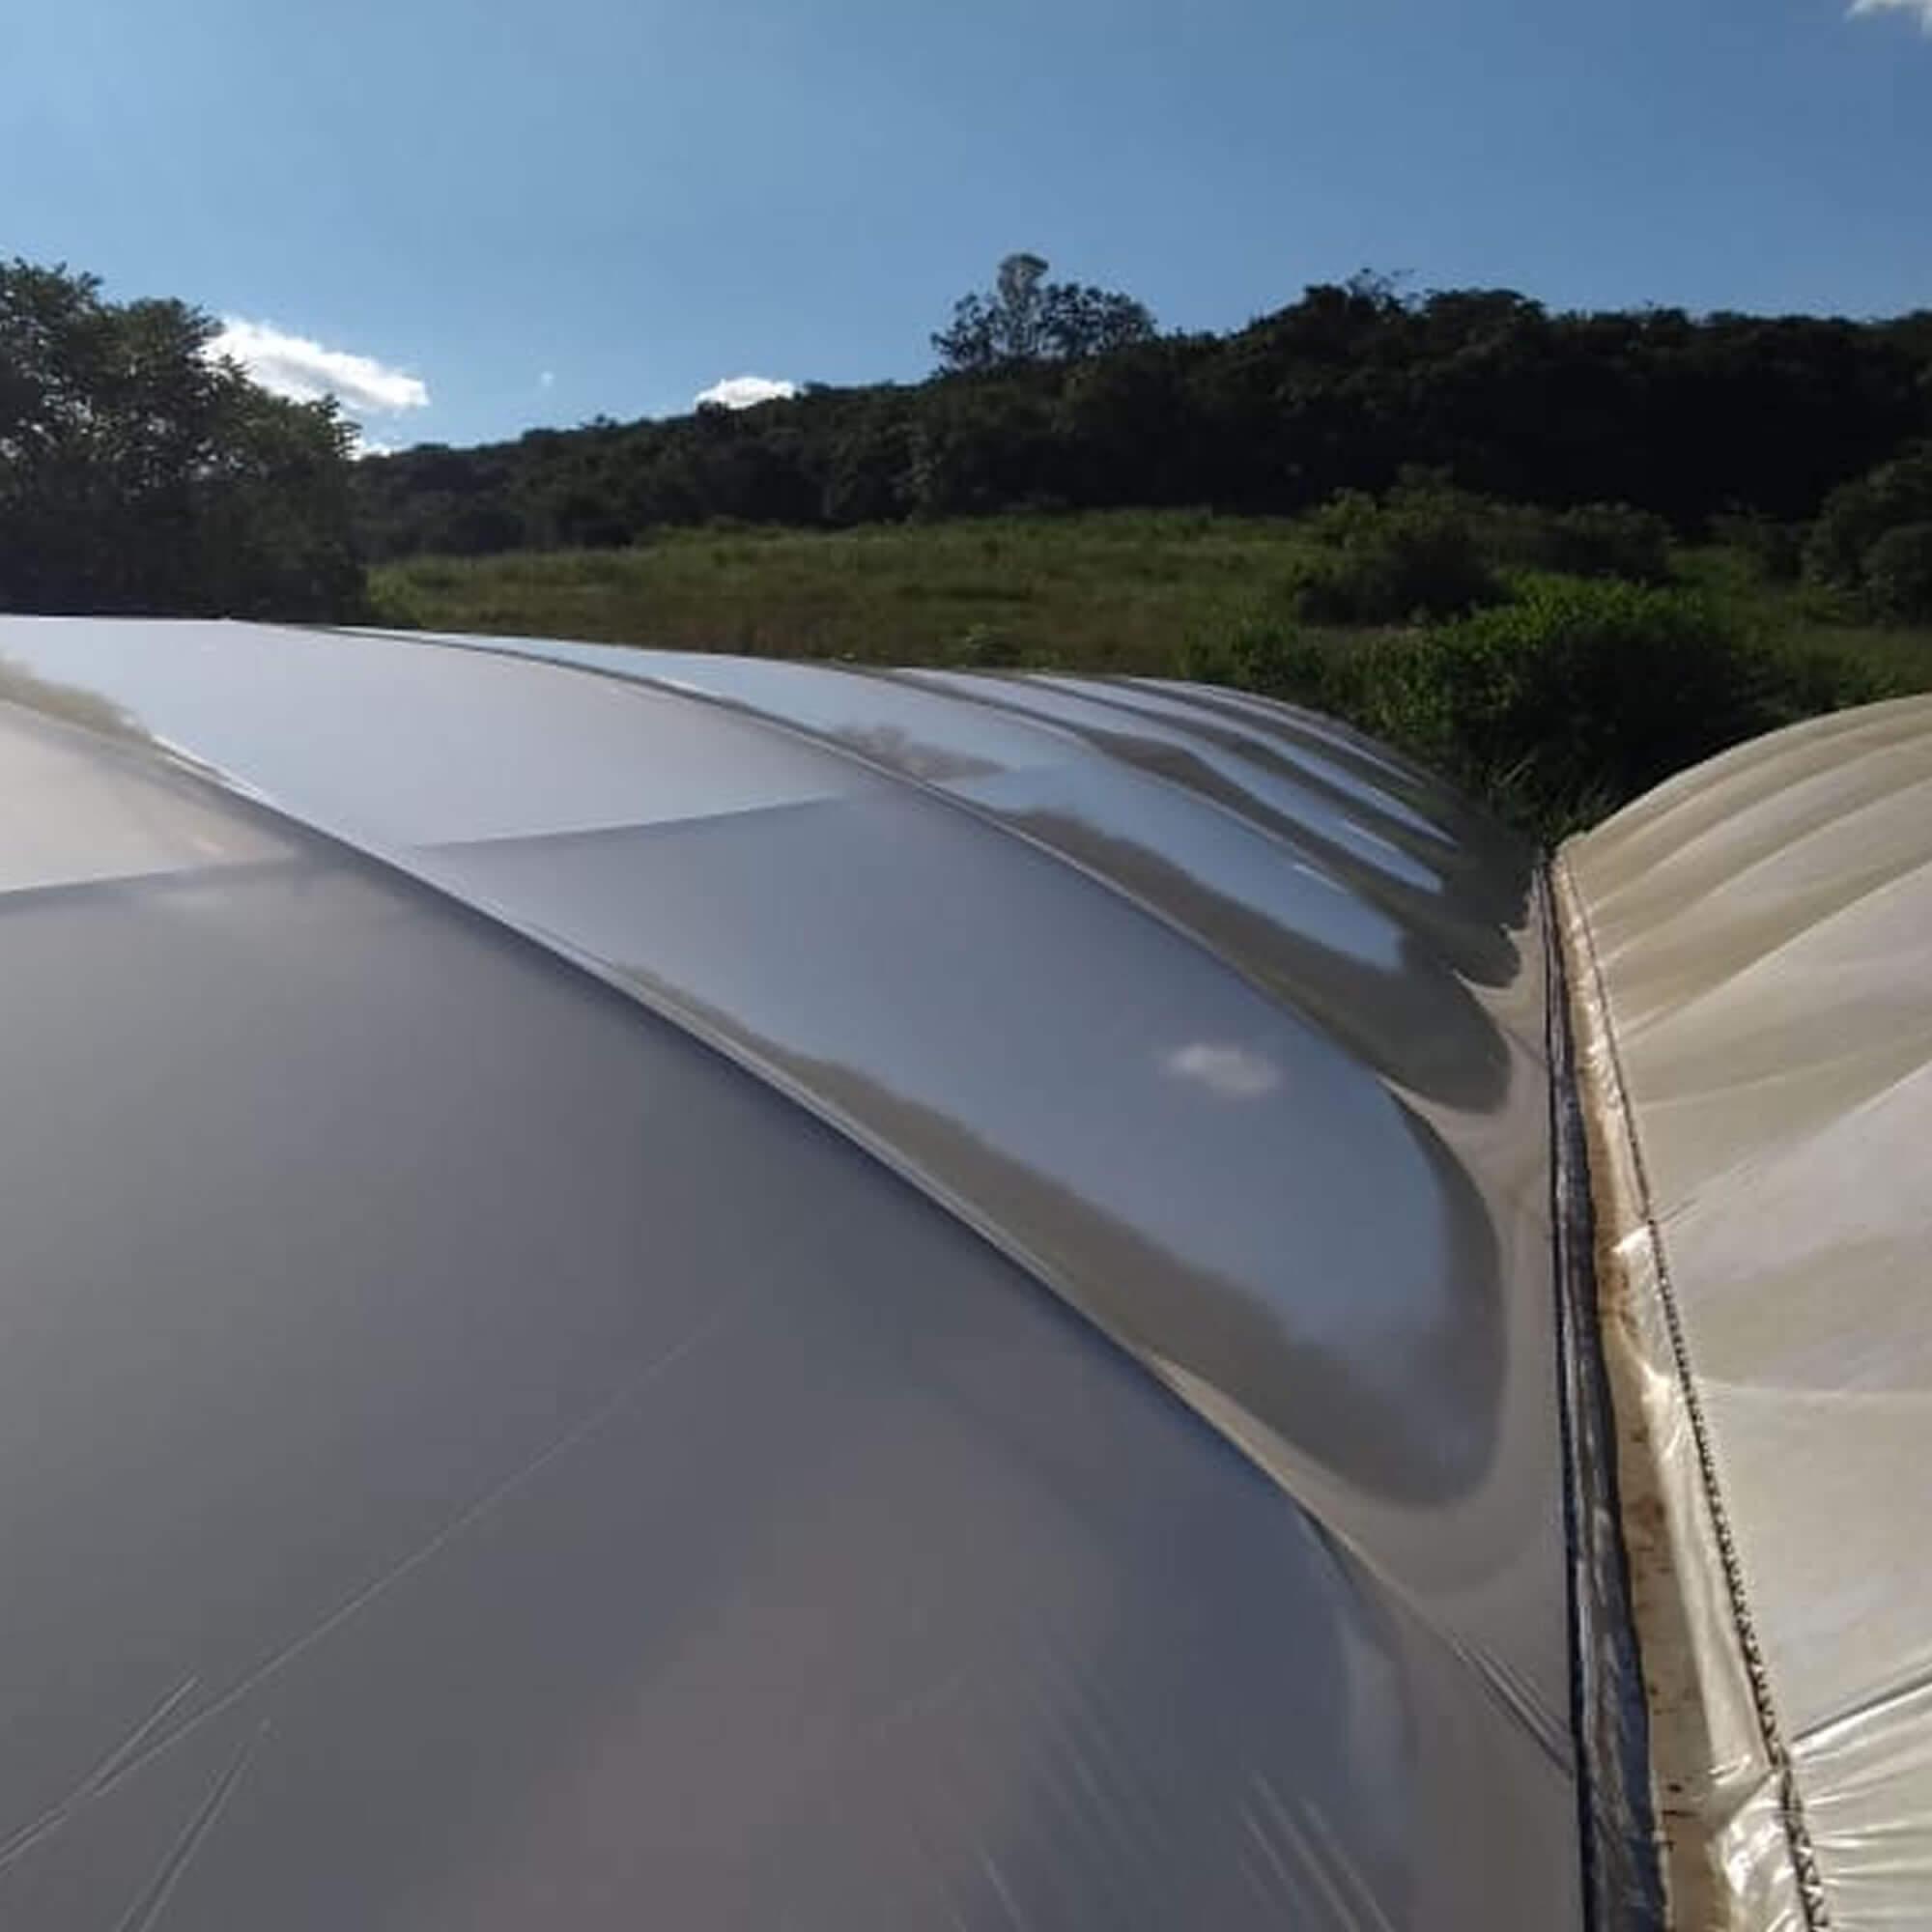 Filme Plástico Difusor para Estufa - 4x100 metros - 120 micras - Politiv